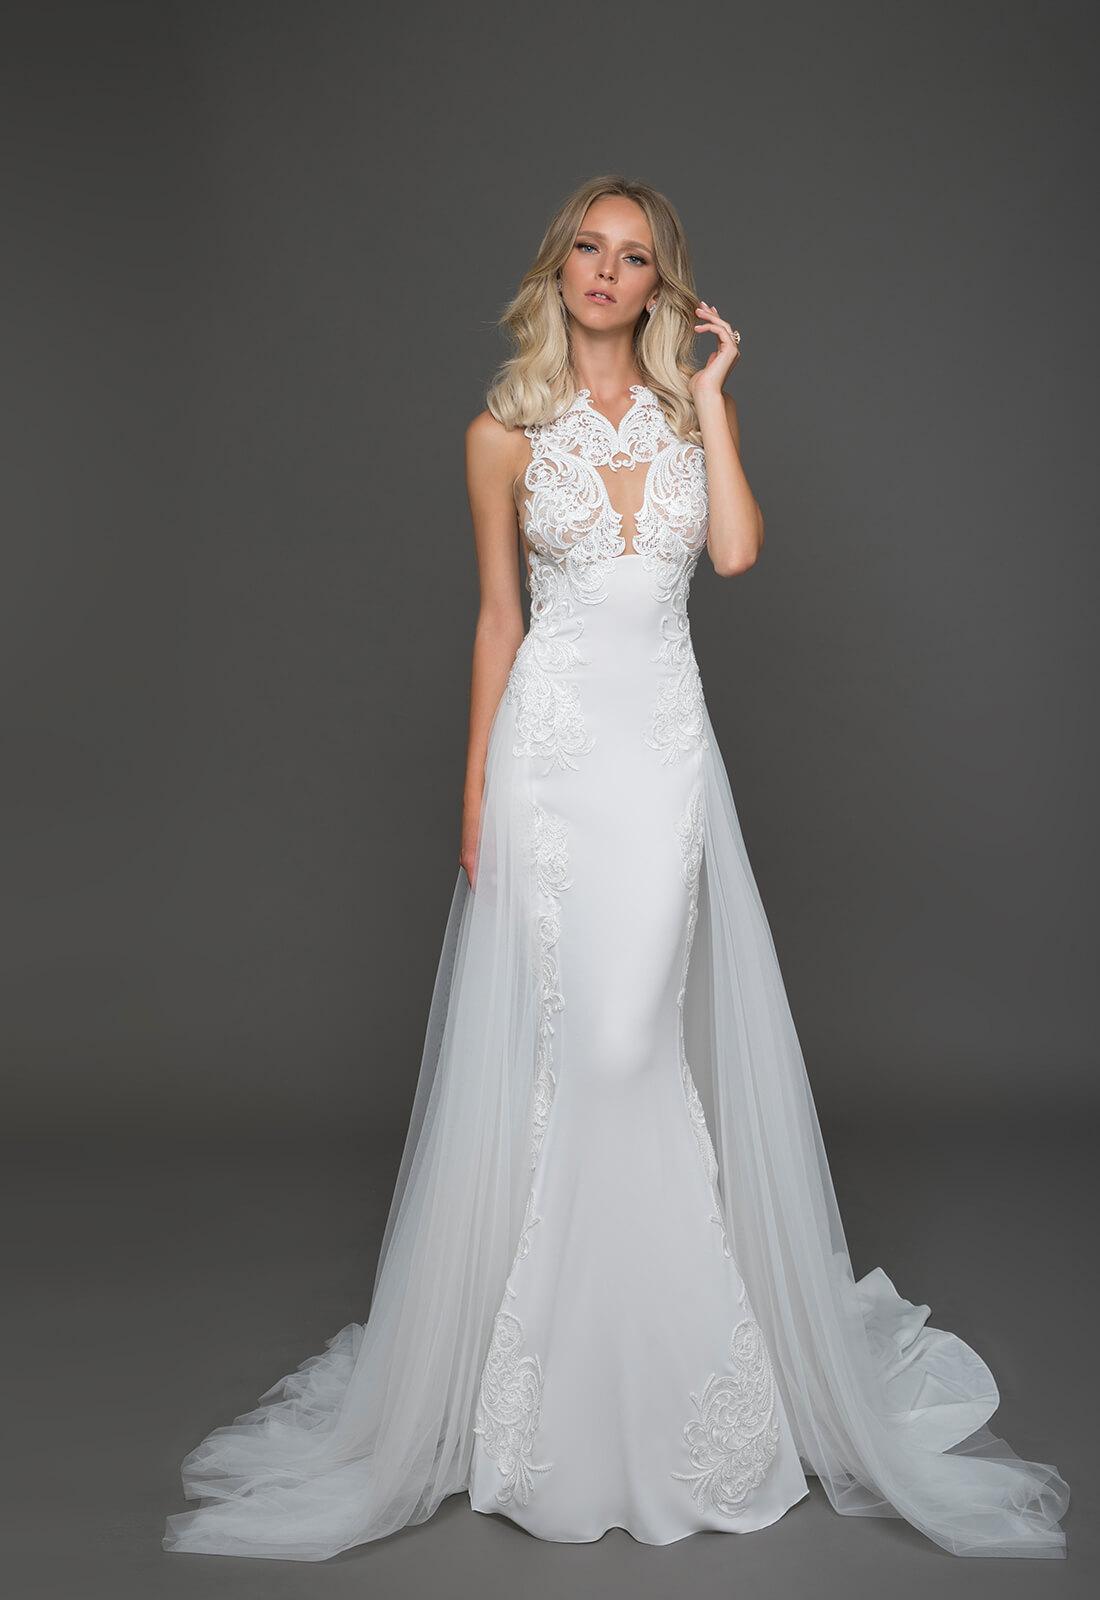 Trendy sheath wedding dress kleinfeld bridal trendy sheath wedding dress by pnina tornai image 1 zoomed in junglespirit Choice Image